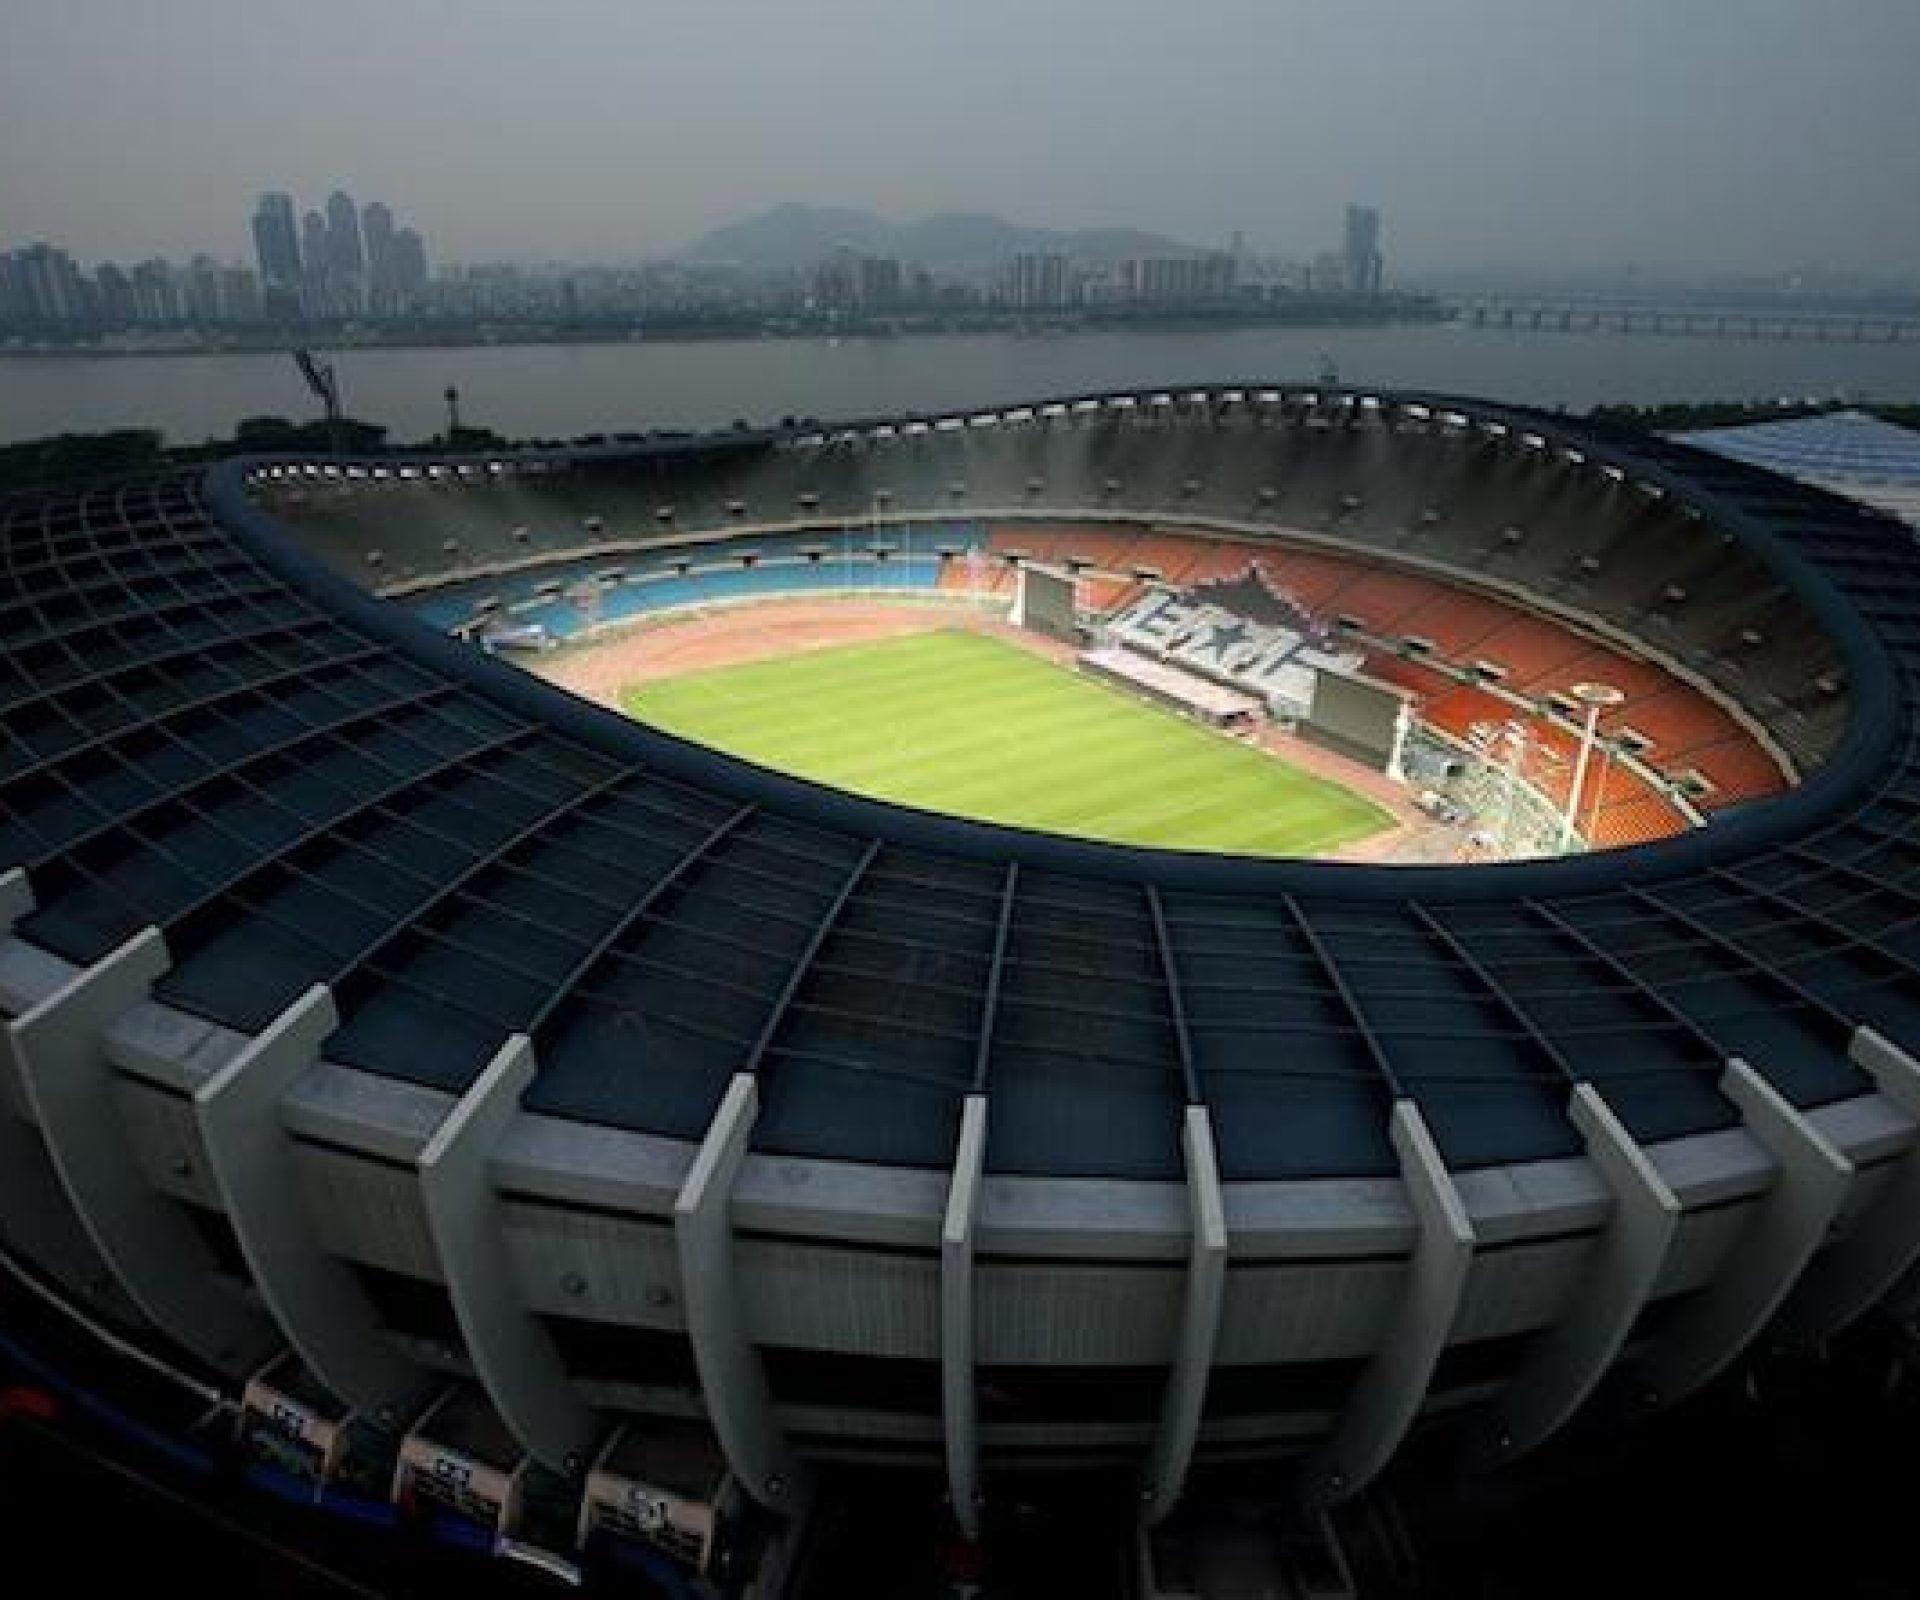 Seoul Olympic Stadium | Songpa-gu, Seoul